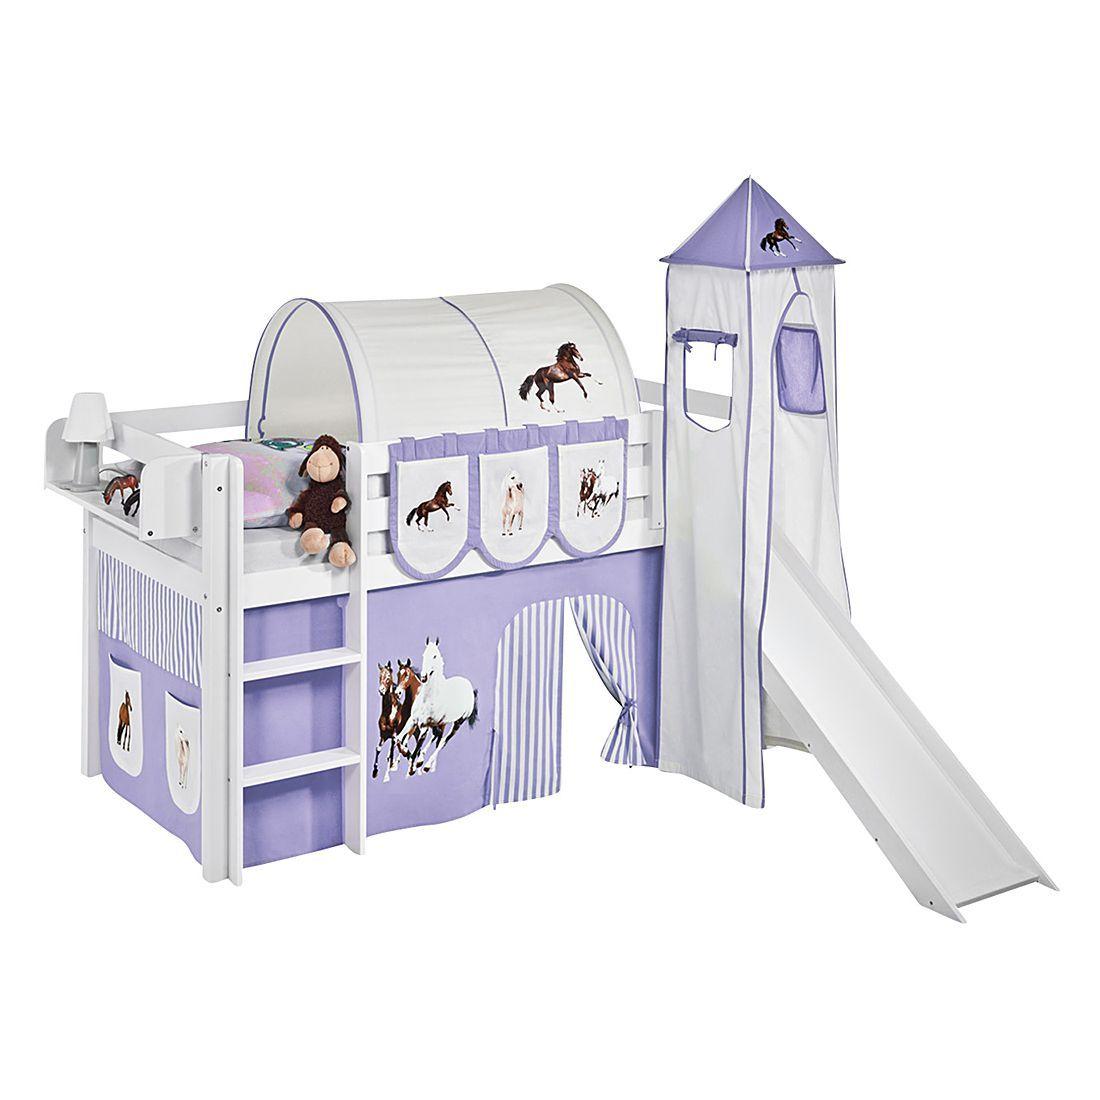 spielbett jelle pferde lila - hochbett lilokids - mit turm und ... - Kinderzimmer Lila Beige